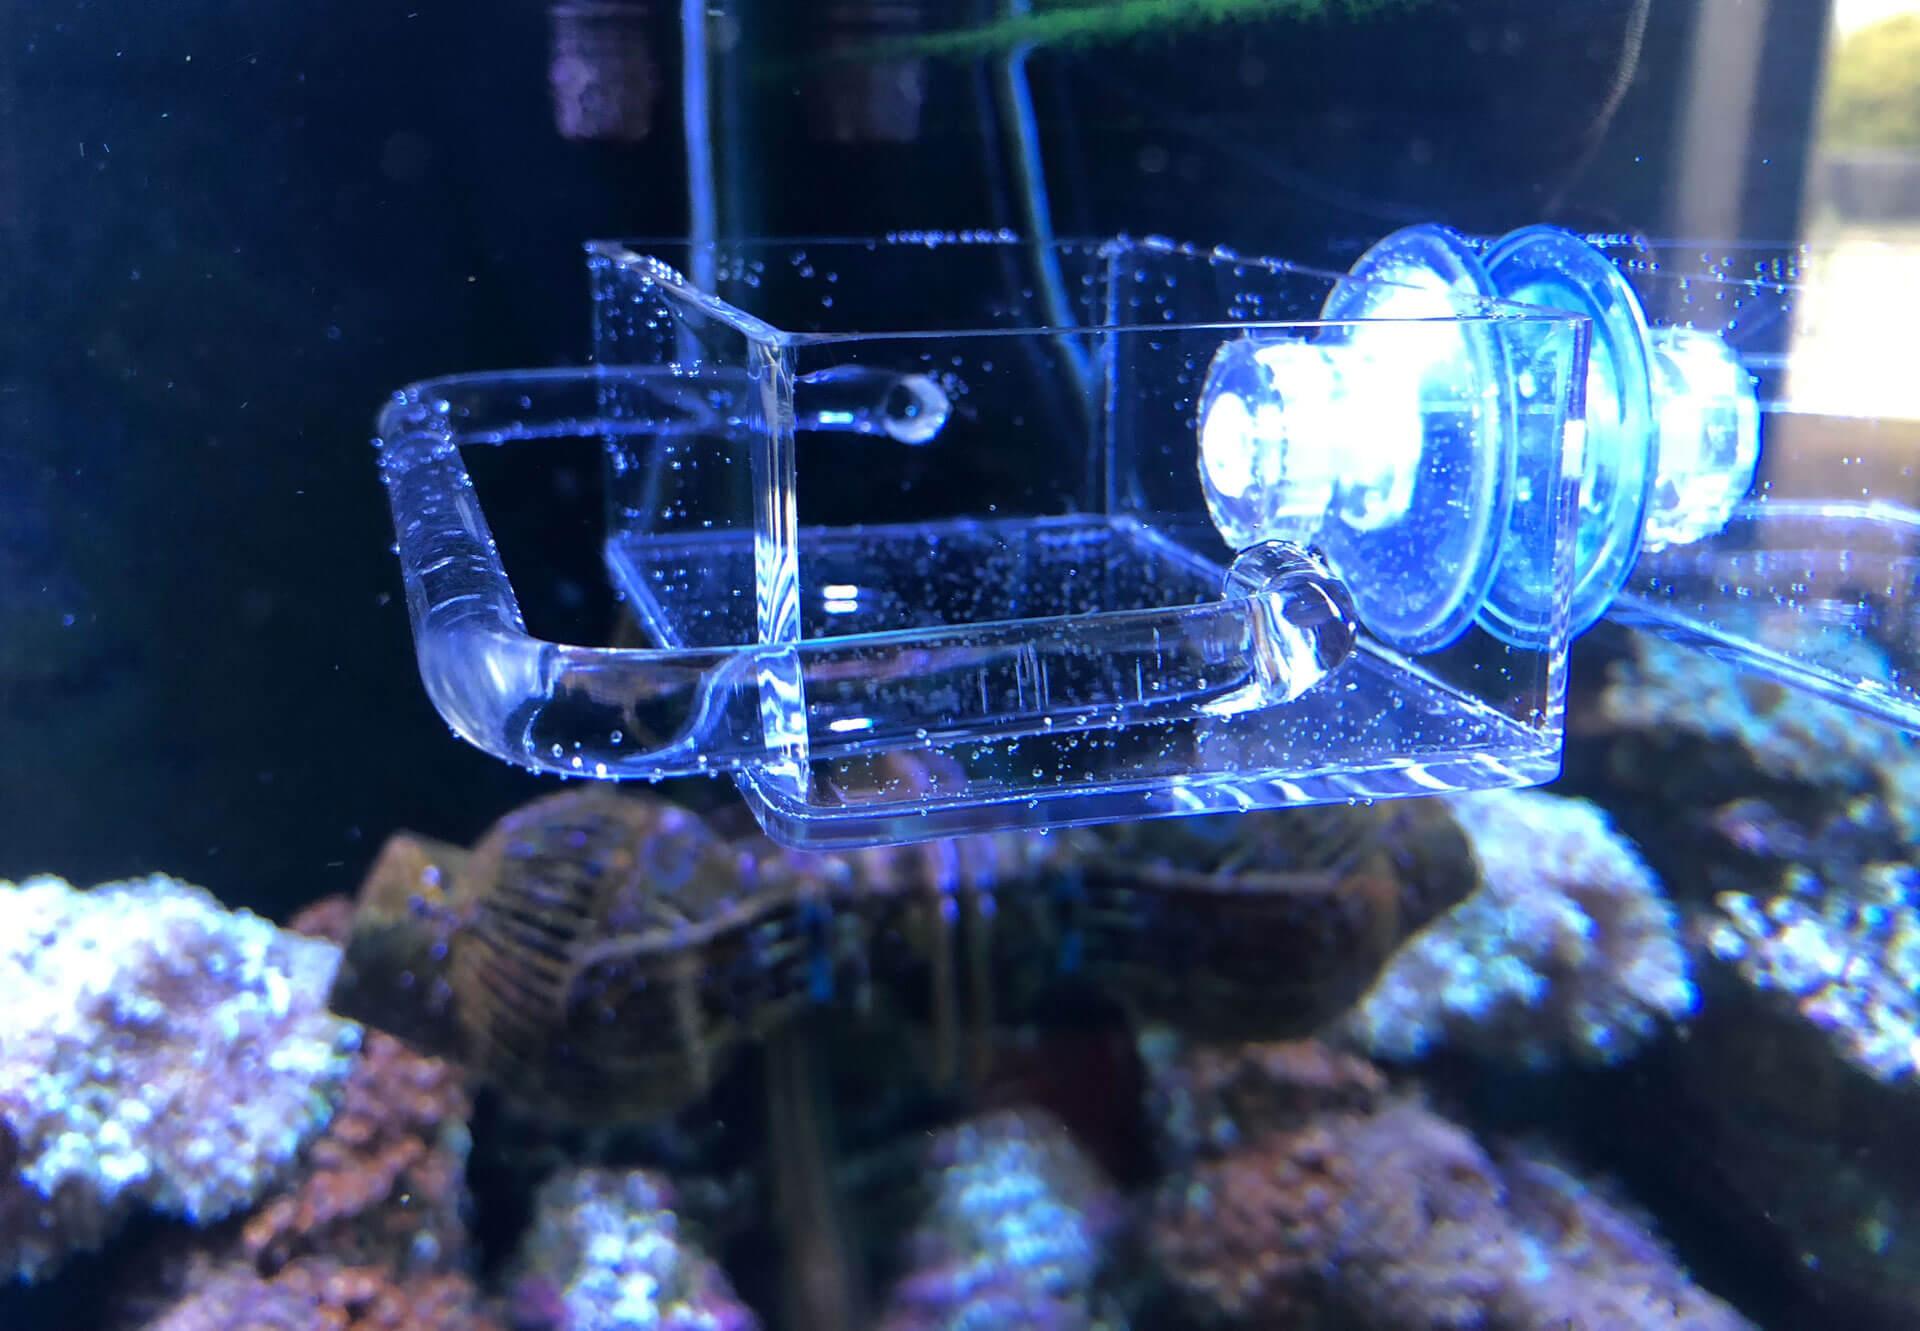 Seahorse Buddy Seahorse Feeder v2